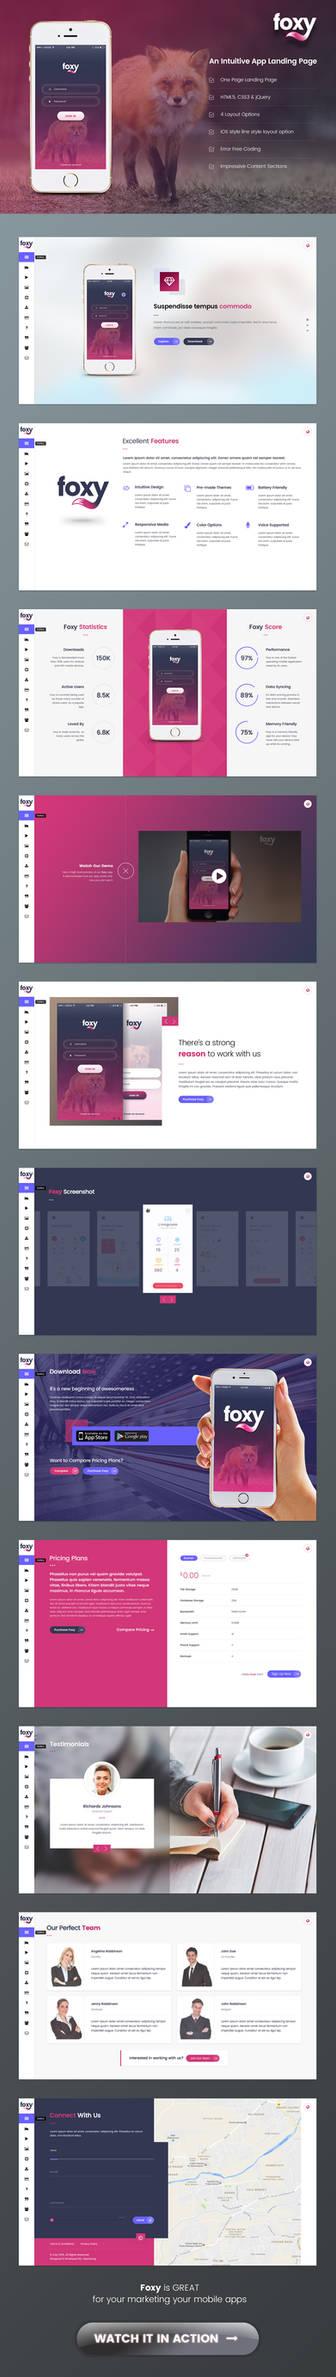 Foxy App Landing Page by Saptarang